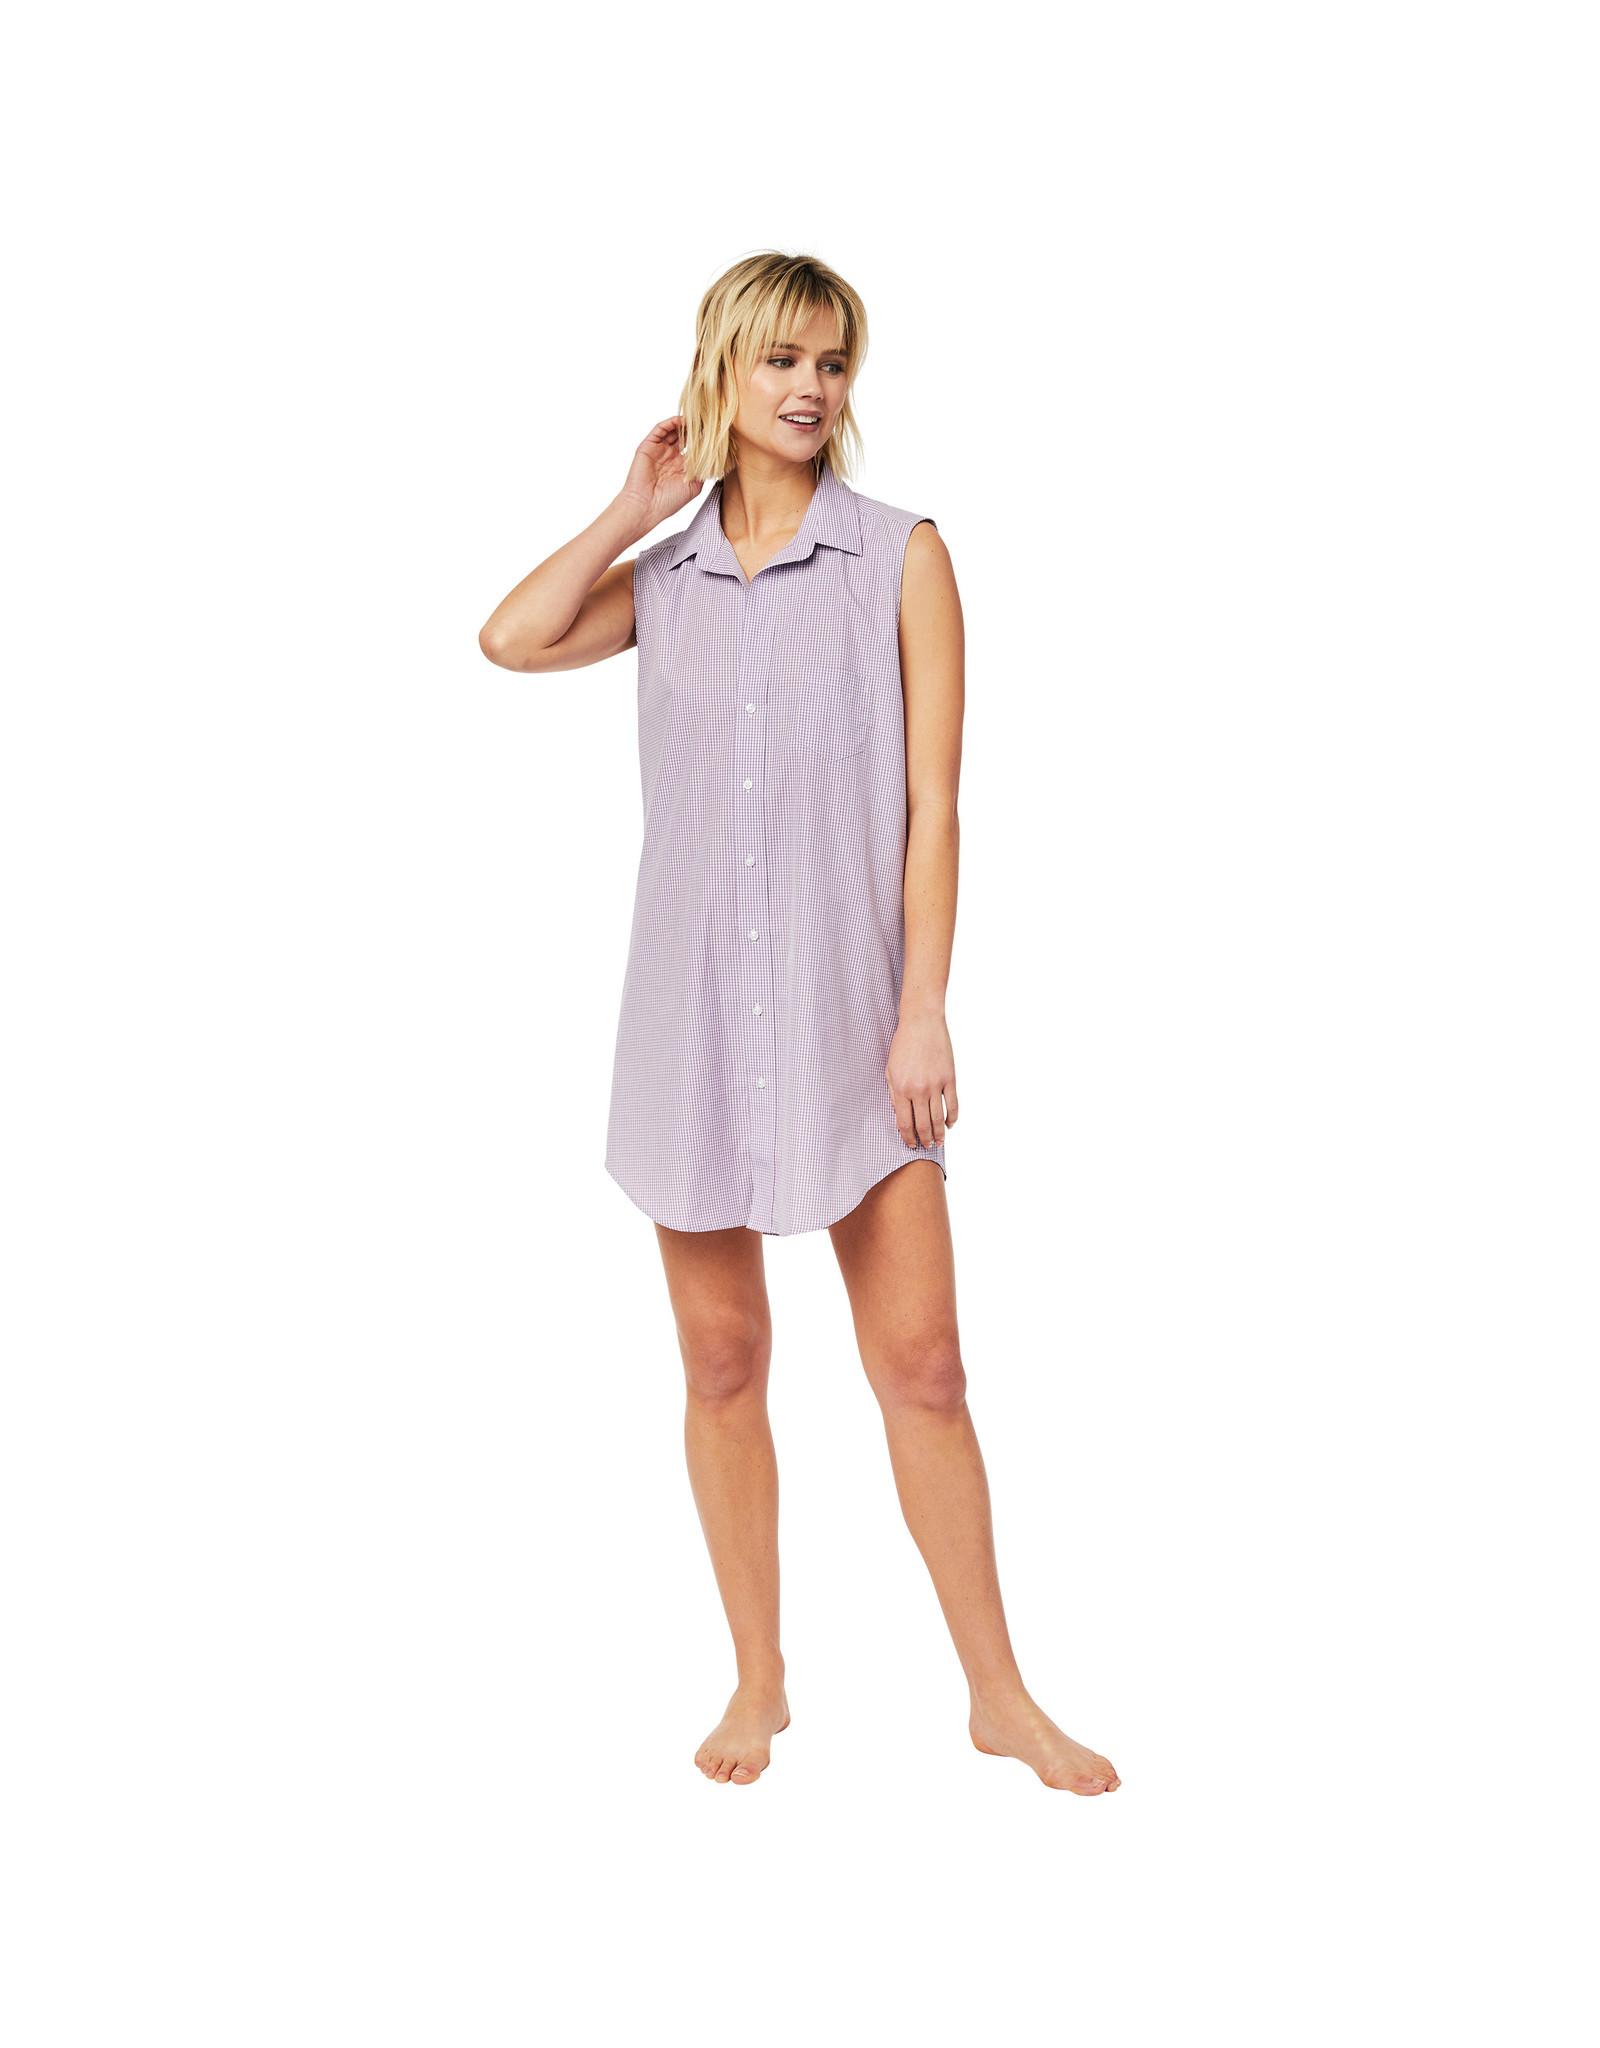 Cat's Pajamas Lavender Check Woven Pima Sleeveless Night Shirt